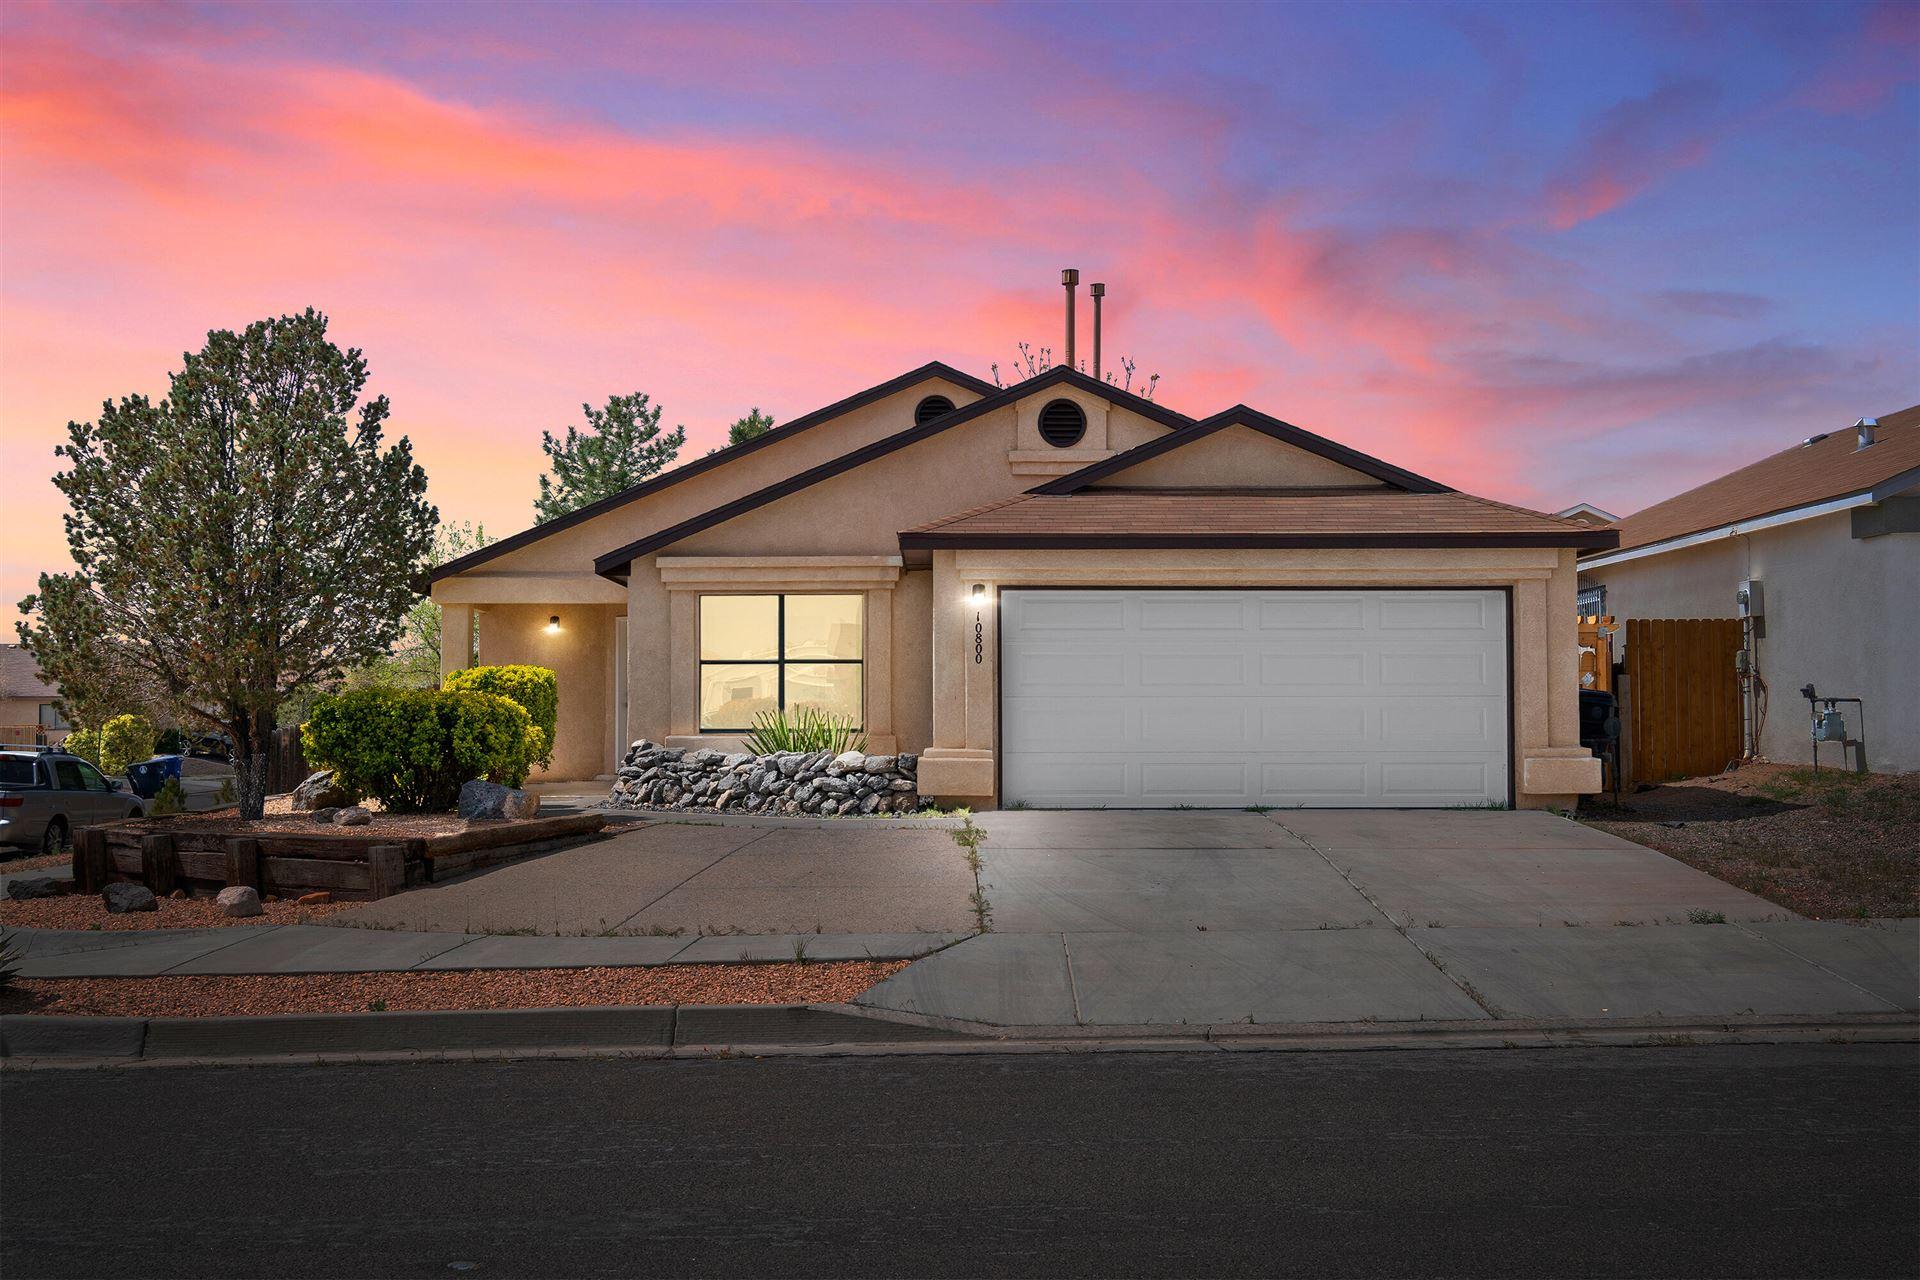 Photo of 10800 SHETLAND Place SW, Albuquerque, NM 87121 (MLS # 989873)